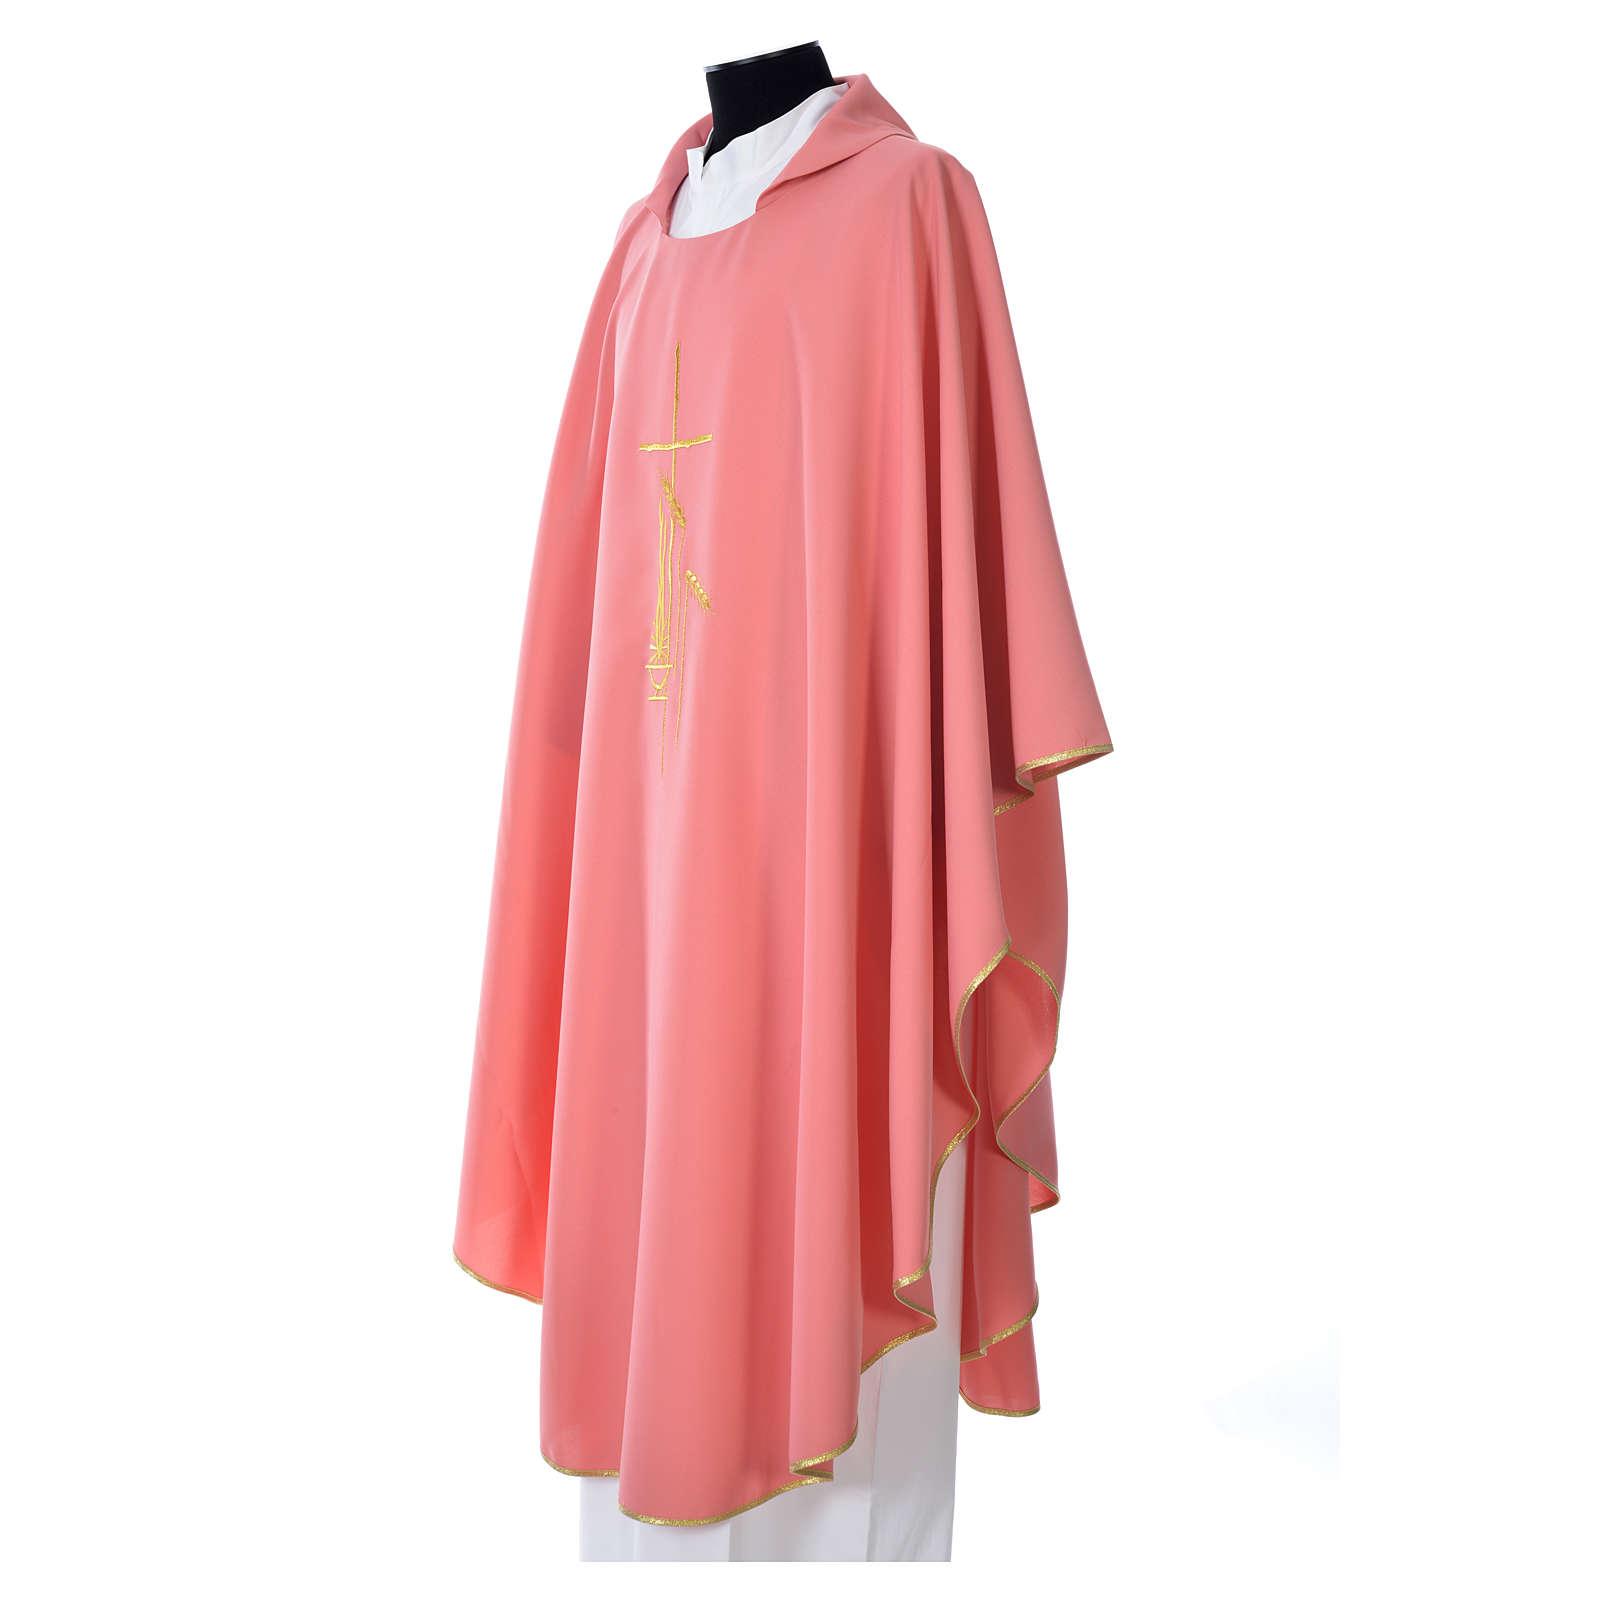 Casula rosa poliestere croce sottile spighe lanterna 4